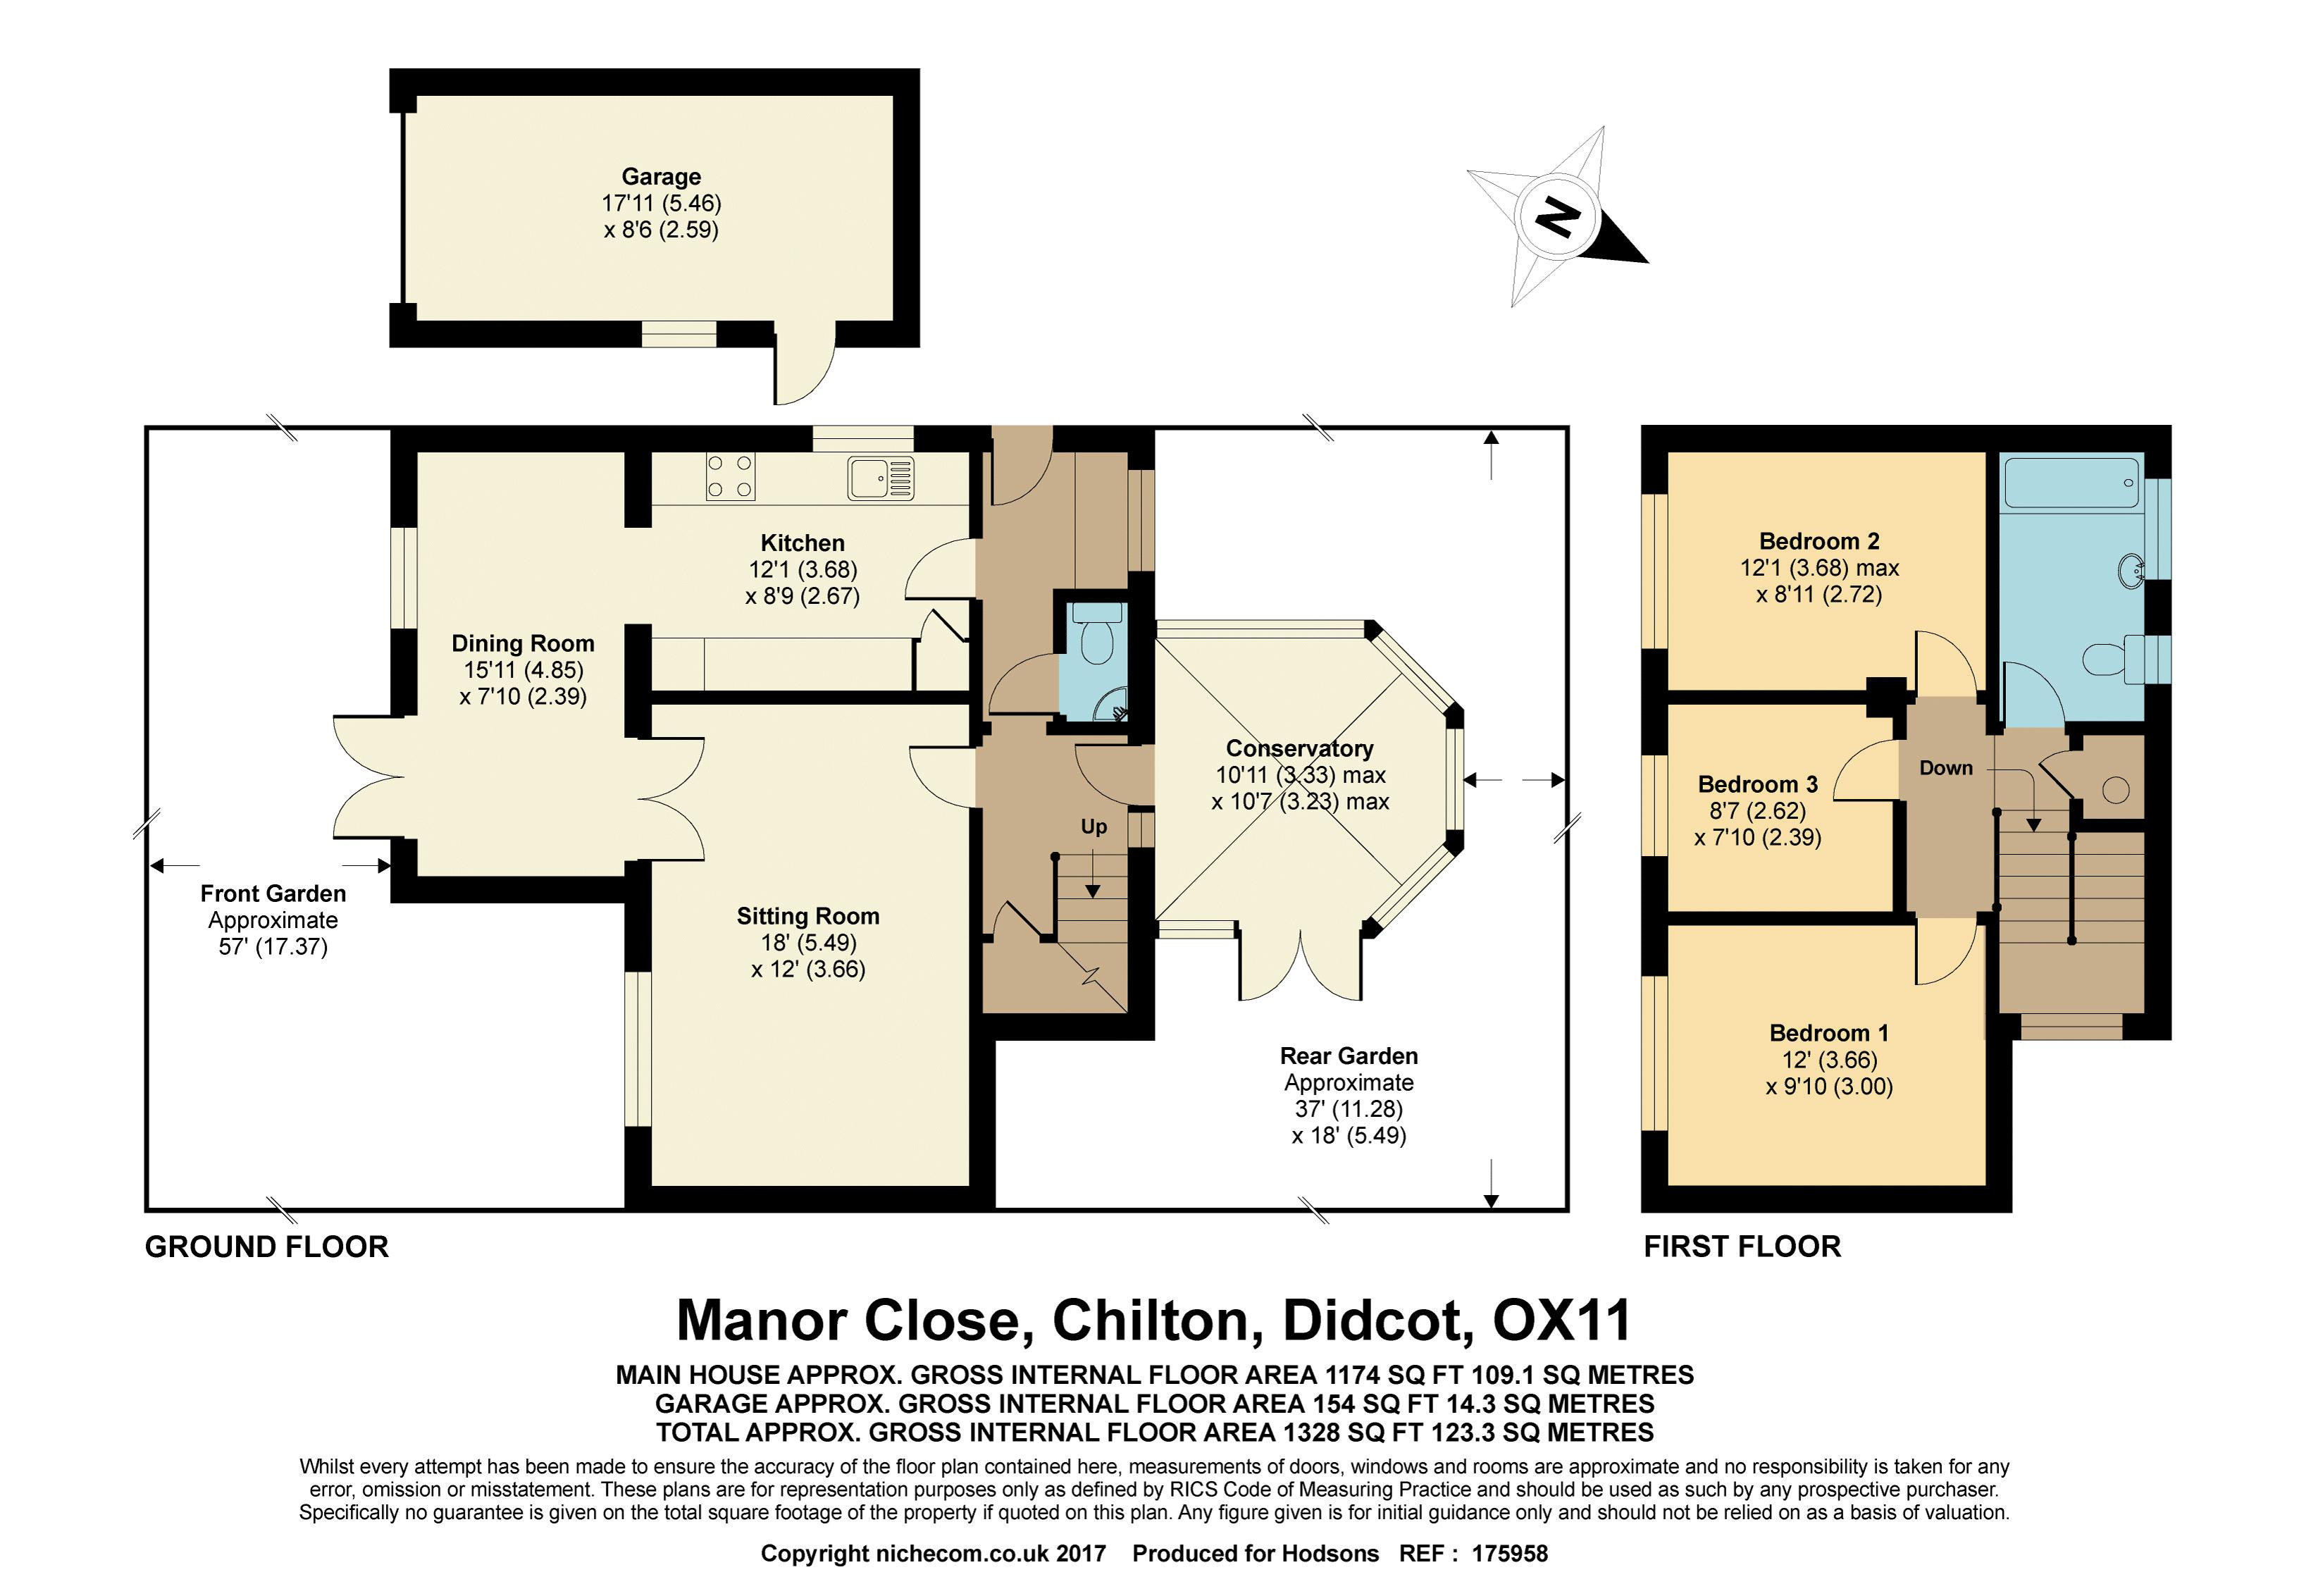 Manor Close Chilton